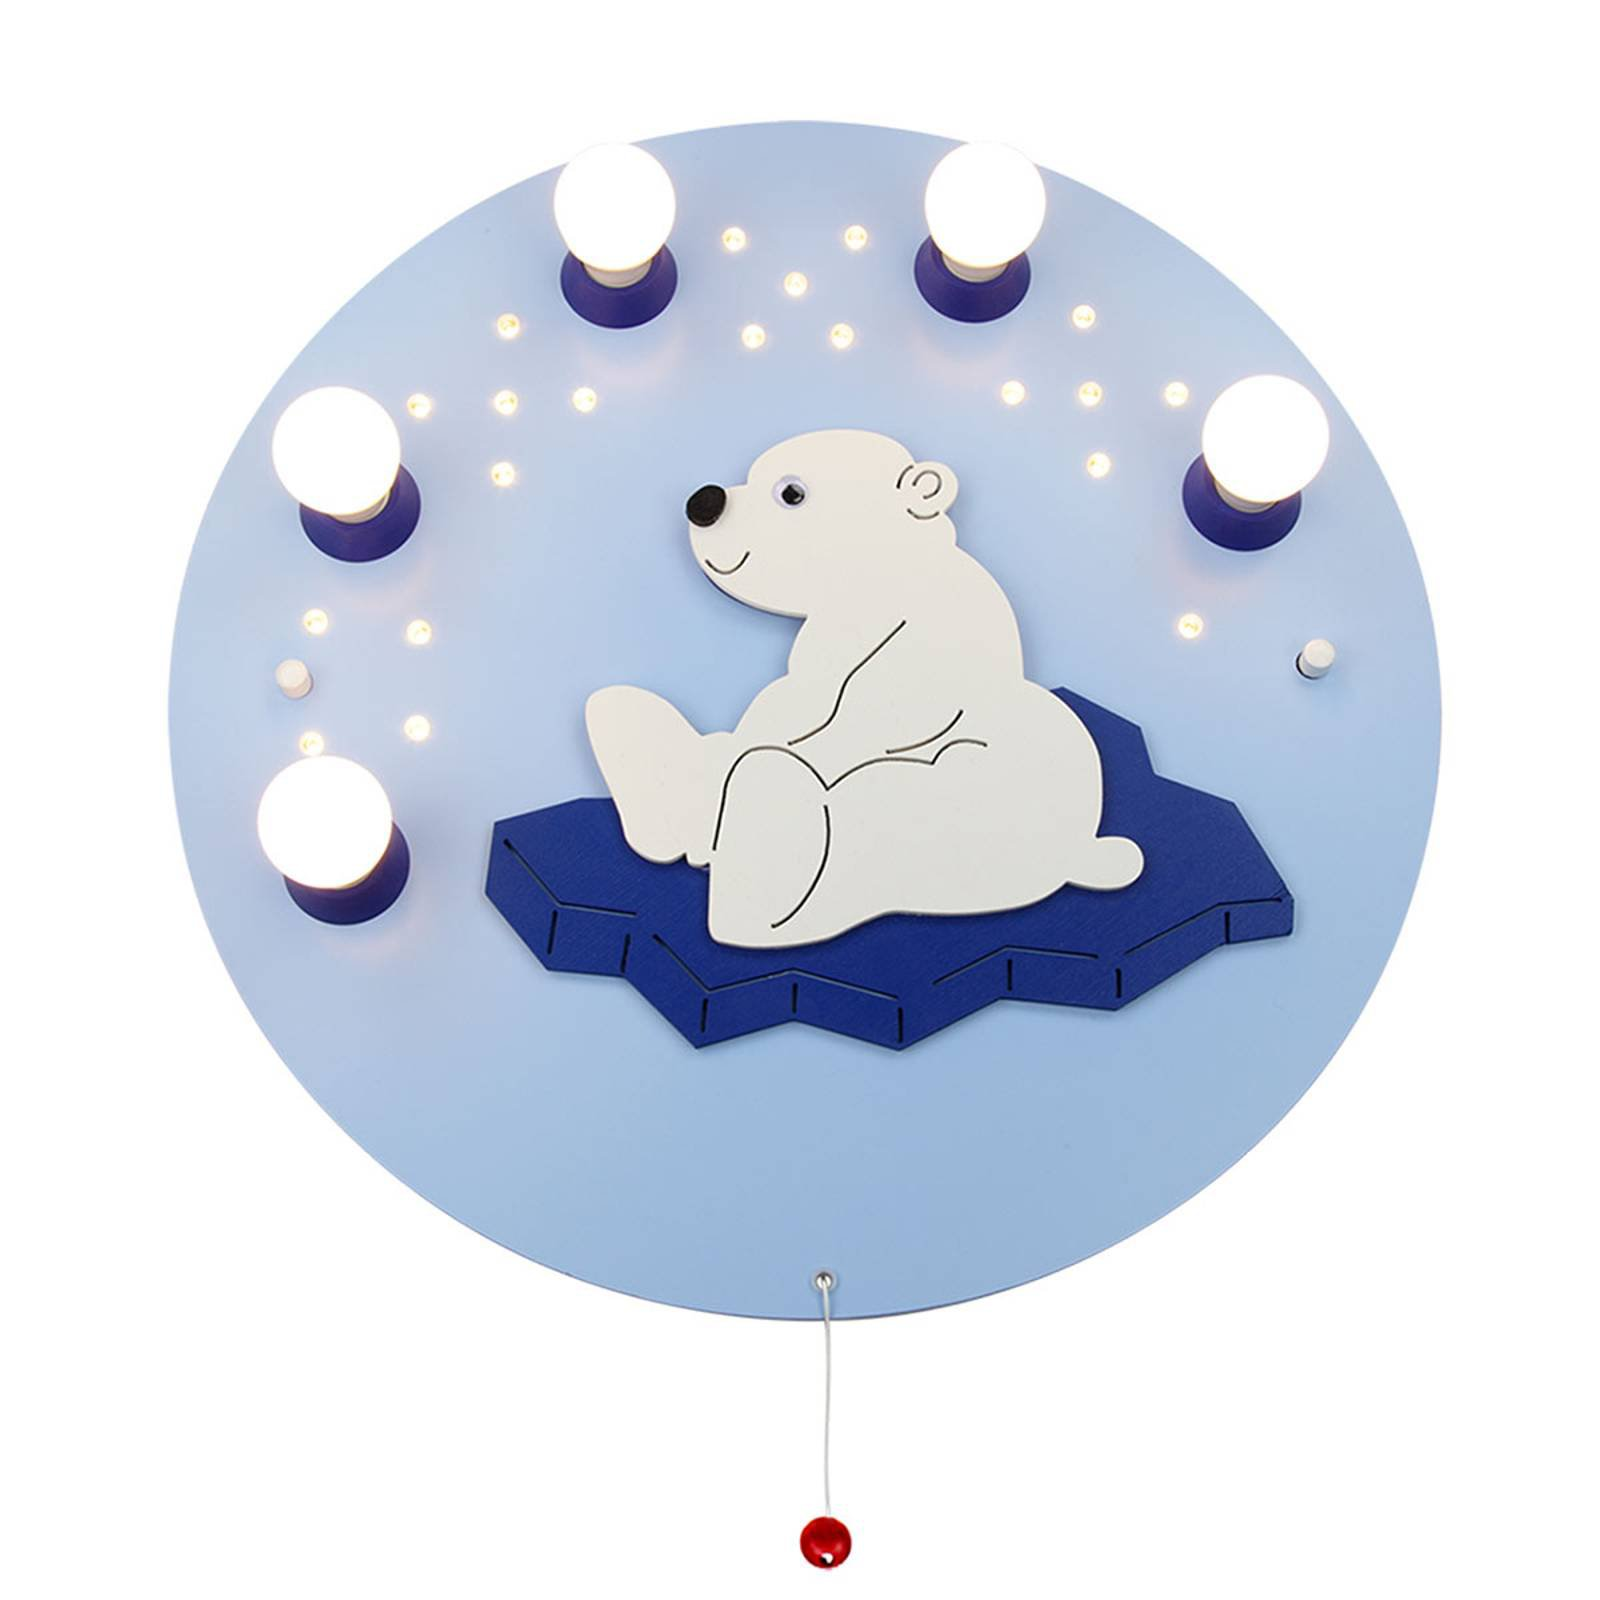 Taklampe Isbjørn, lyseblå, 5 lyskilder